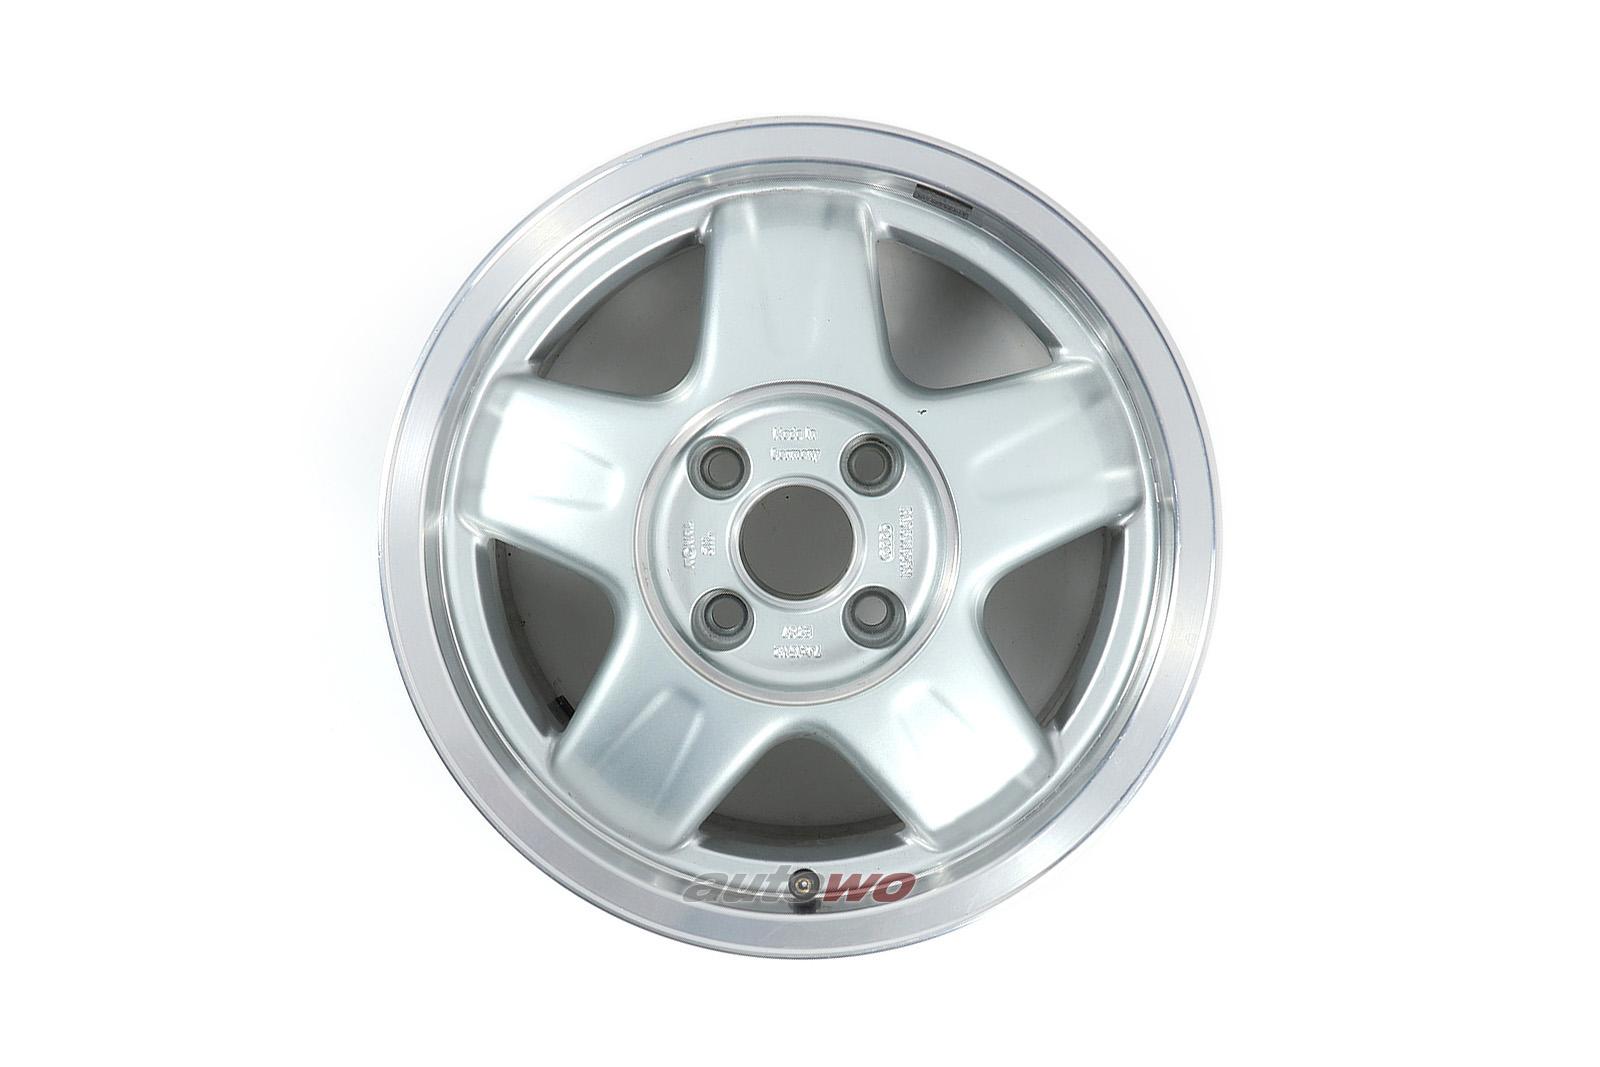 8A0601025M Audi 80 B4/Coupe/Cabrio Sport 5-Speichen-Alufelge 7x15 ET37 4x108